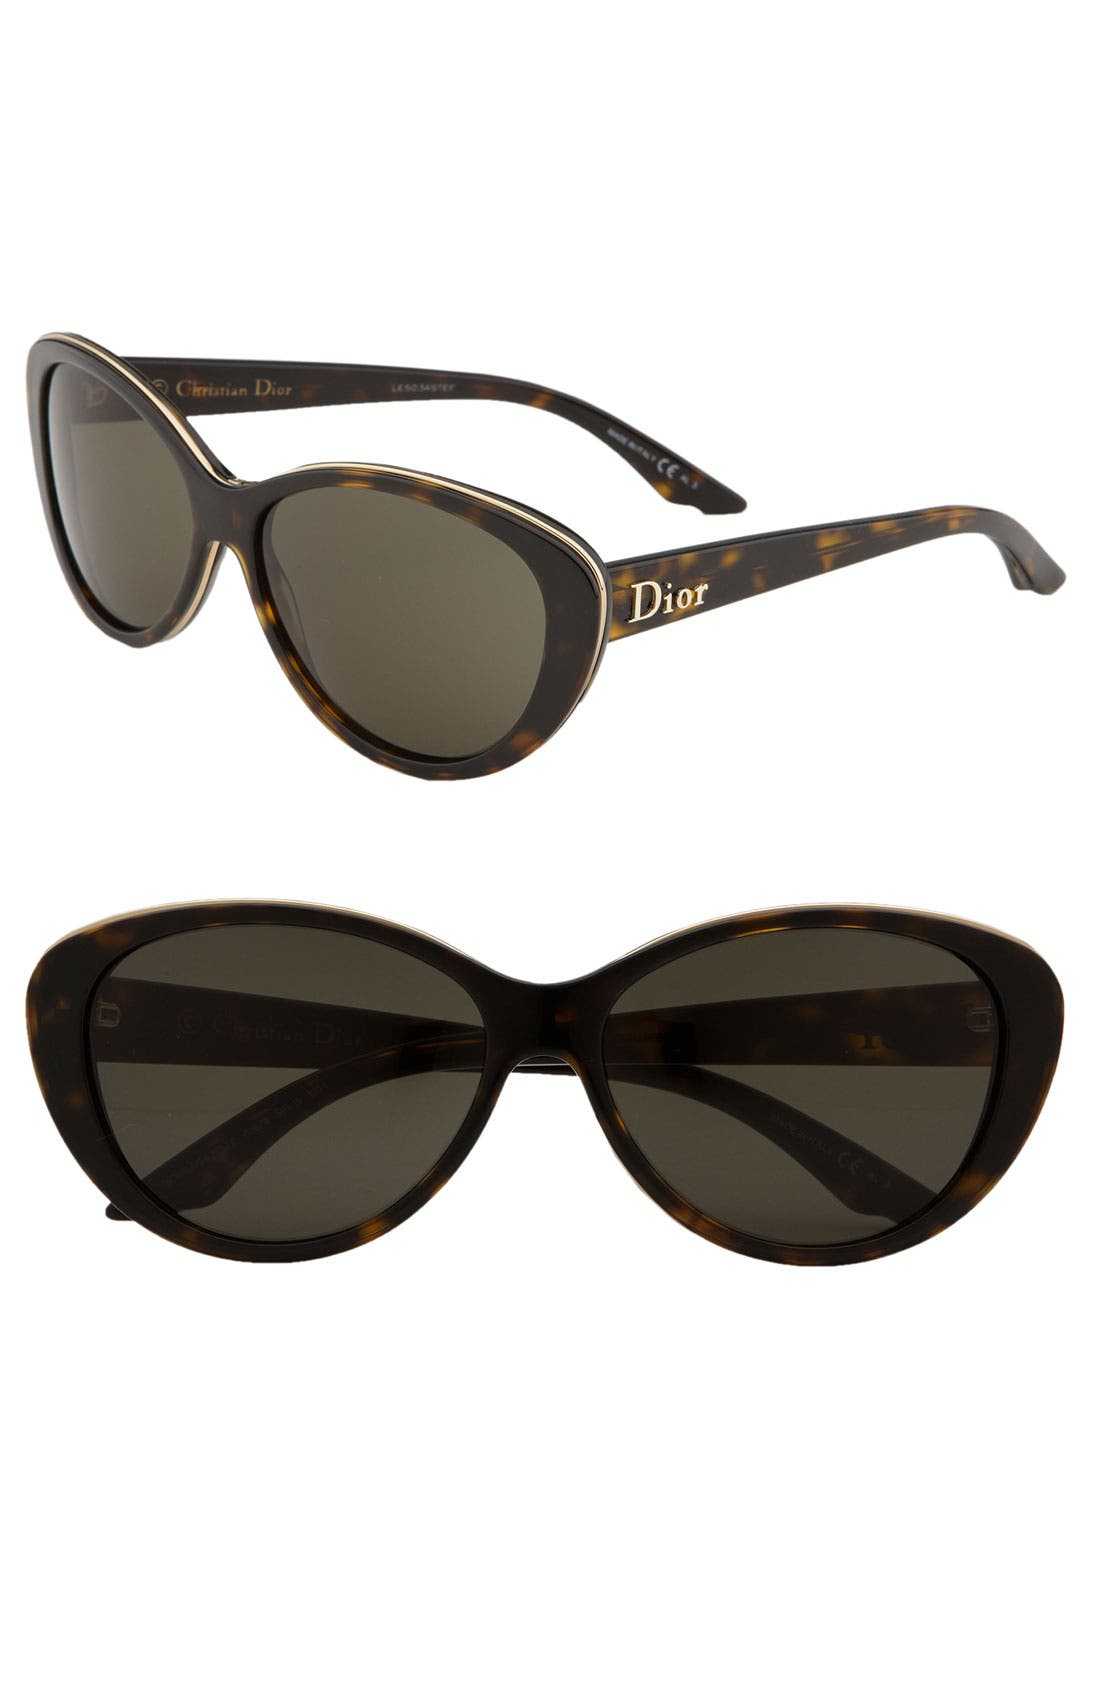 Main Image - Dior 'Bagatelle' Retro Inspired Sunglasses